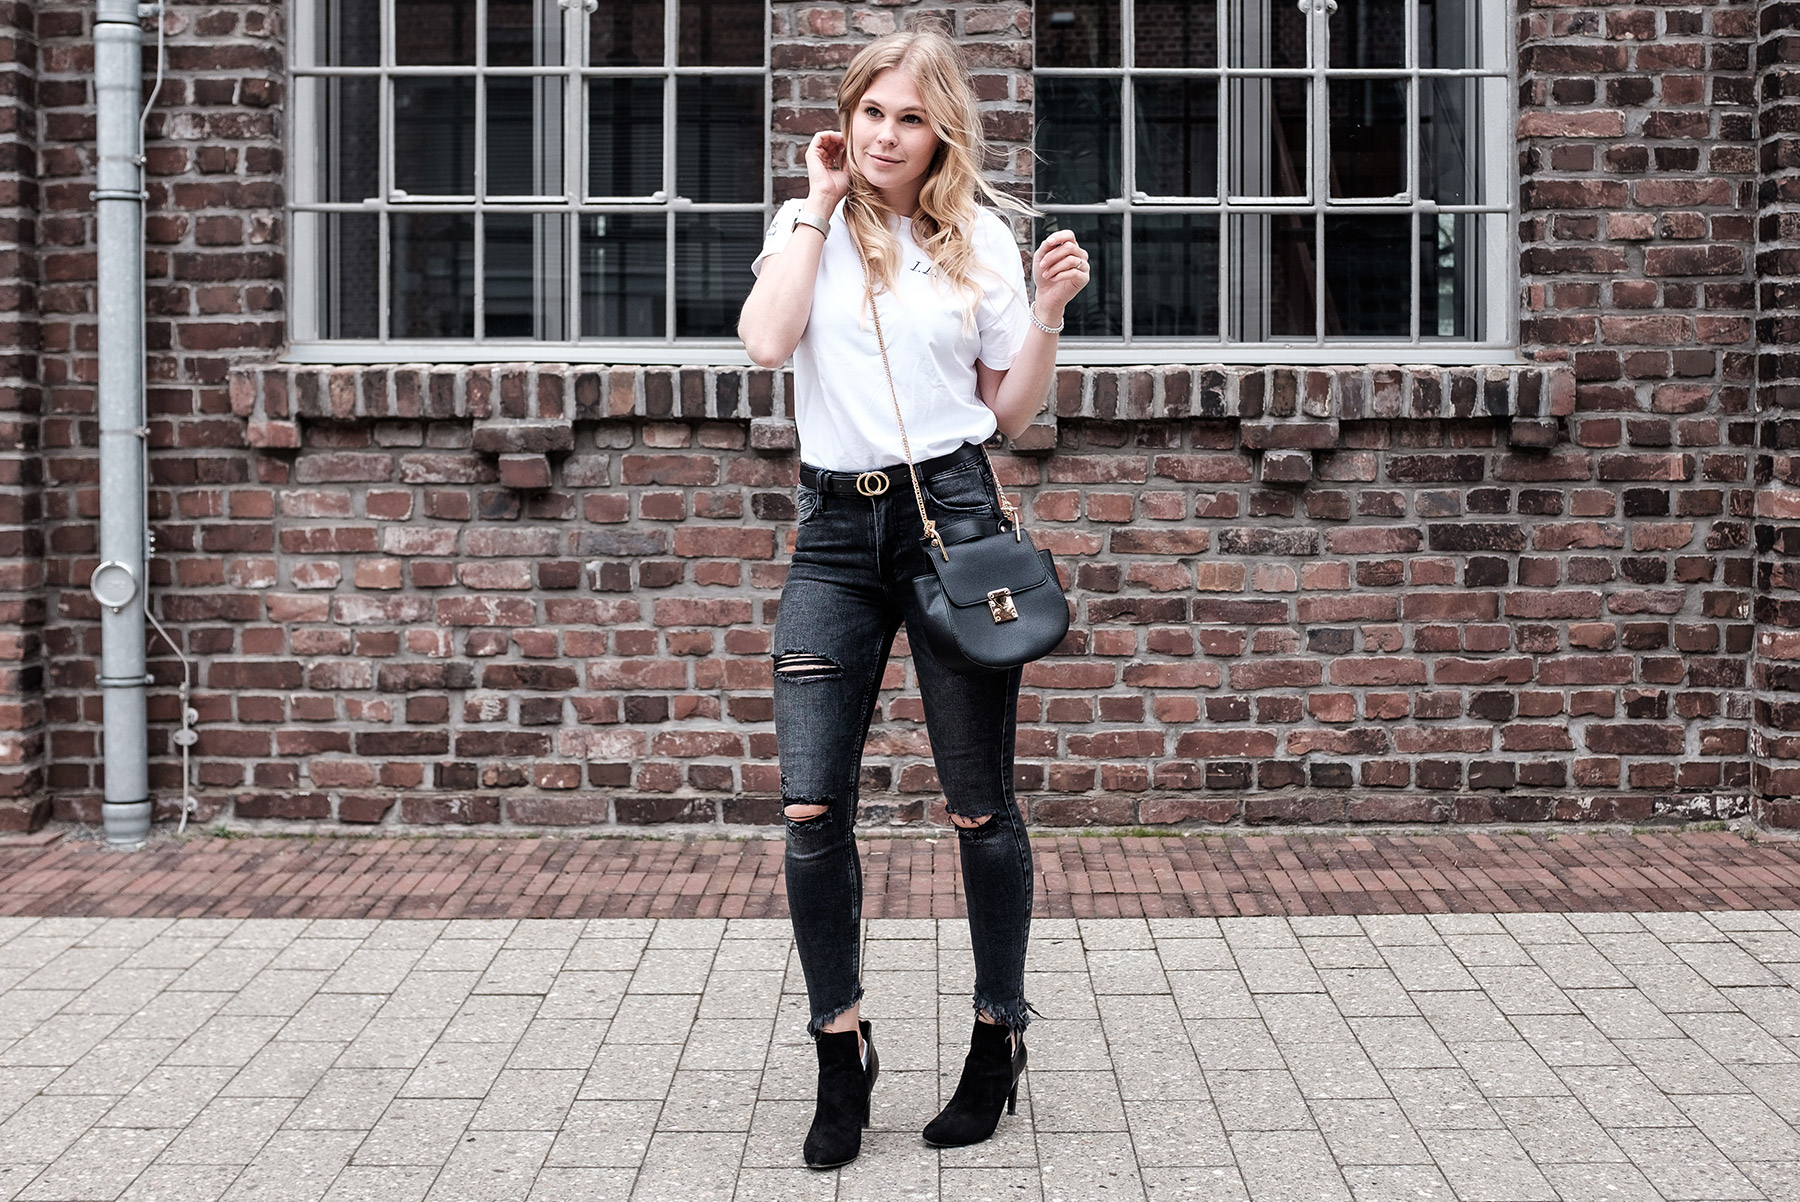 Sunnyinga Fashionblog Düsseldorf About